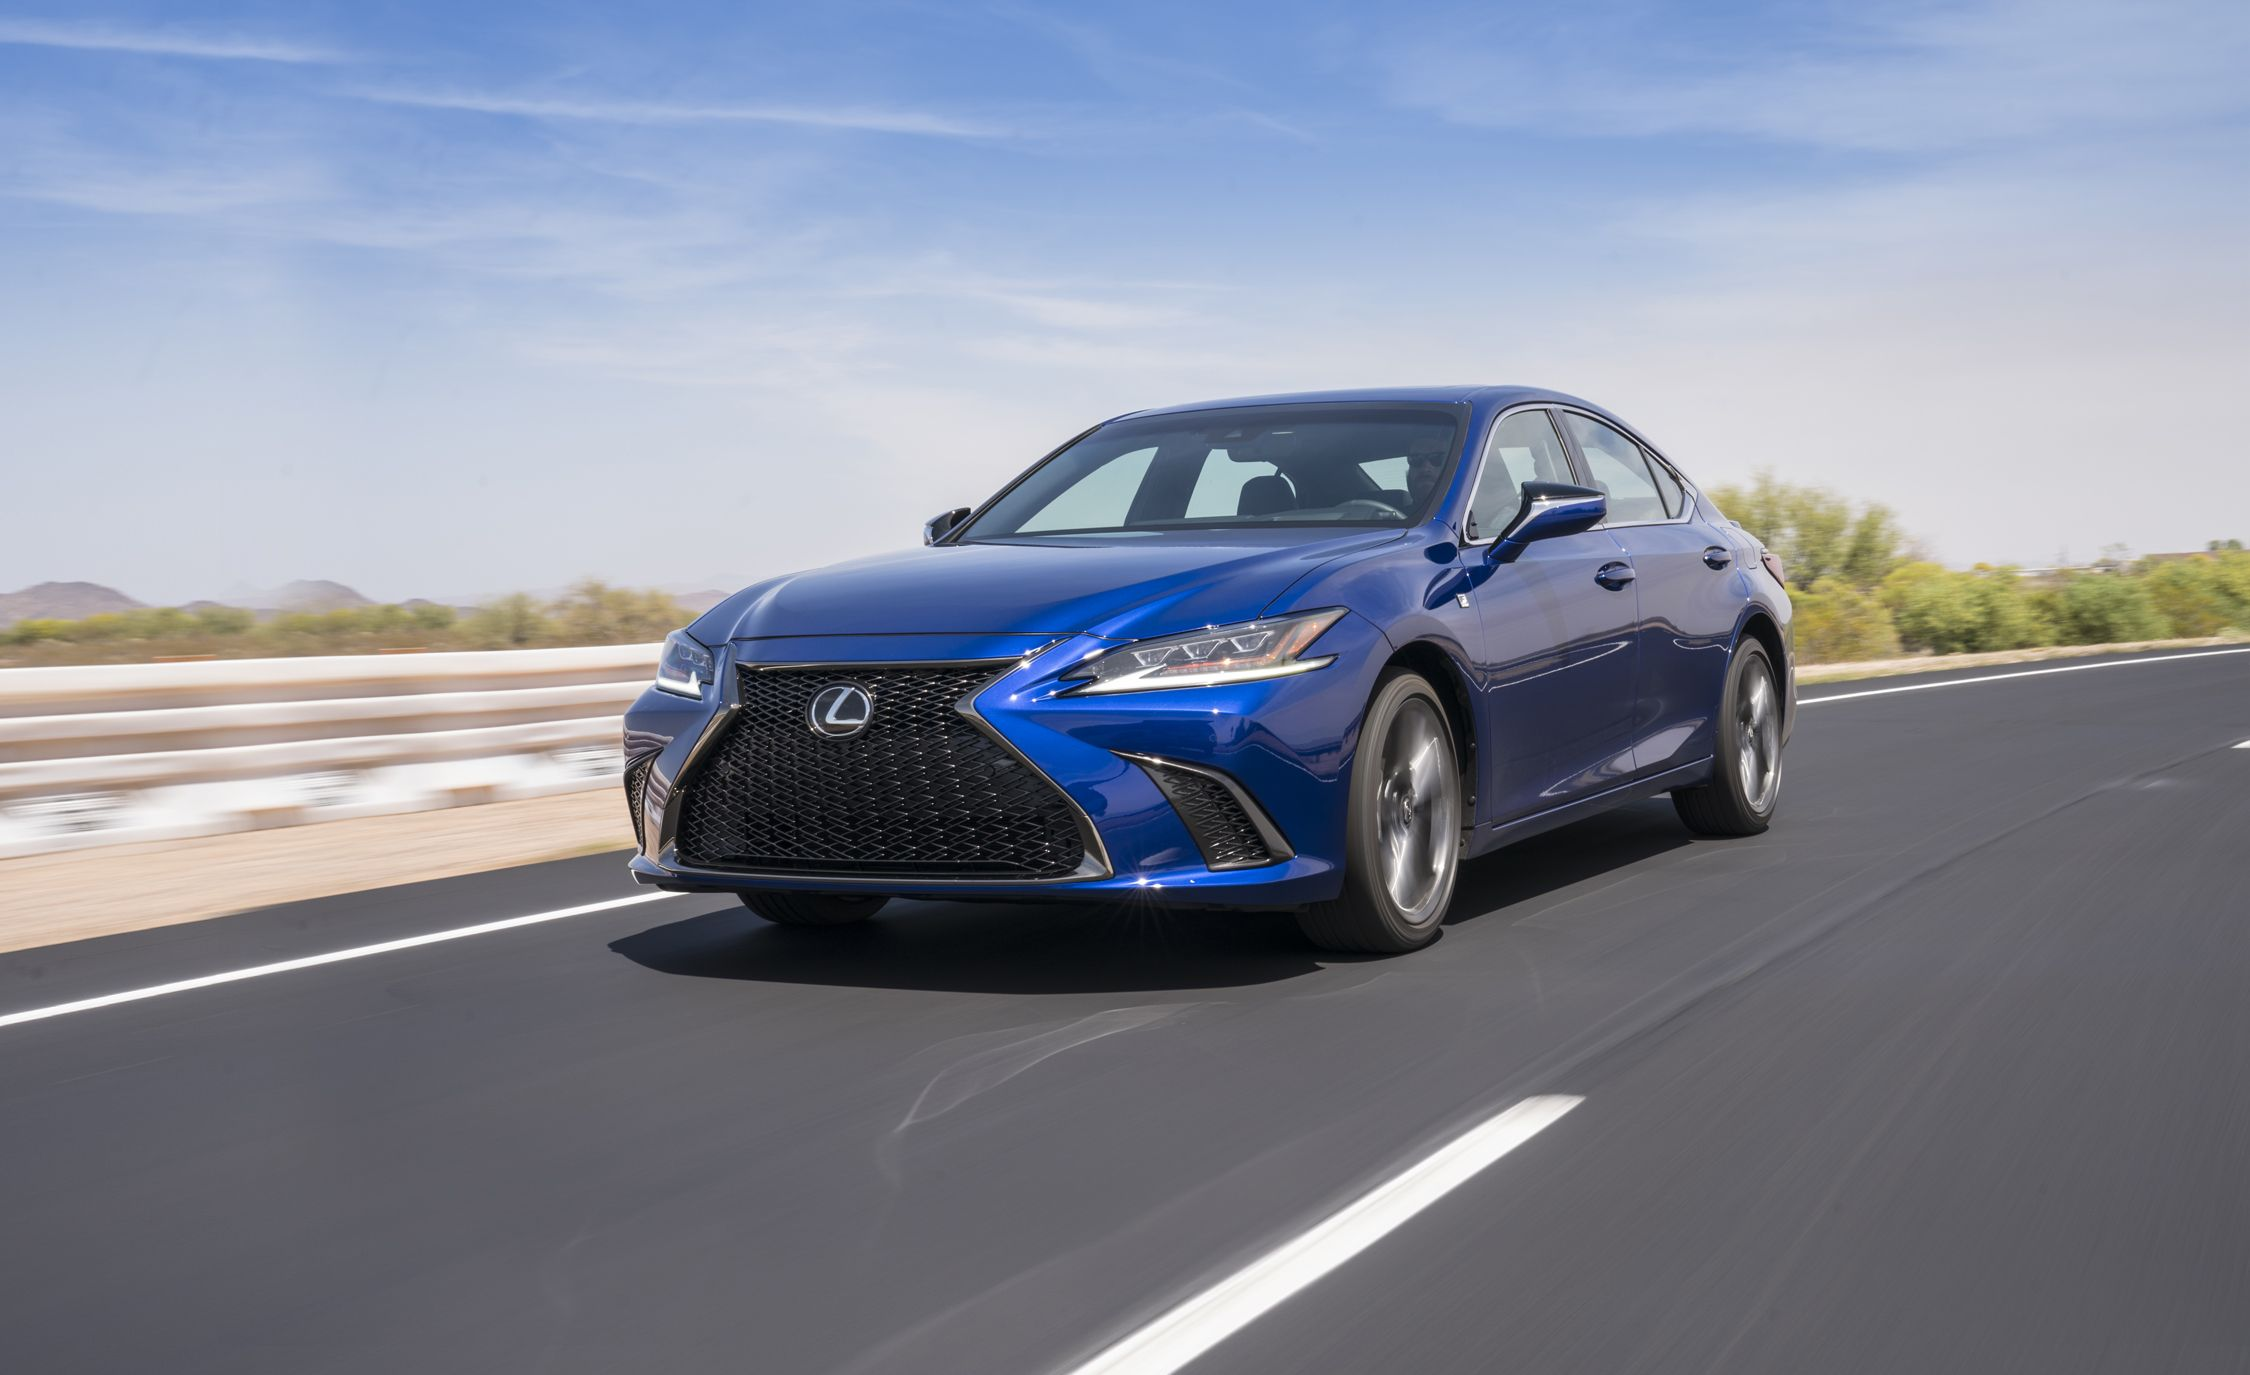 New Lexus Gs 2019 >> 2019 Lexus ES Revealed | News | Car and Driver